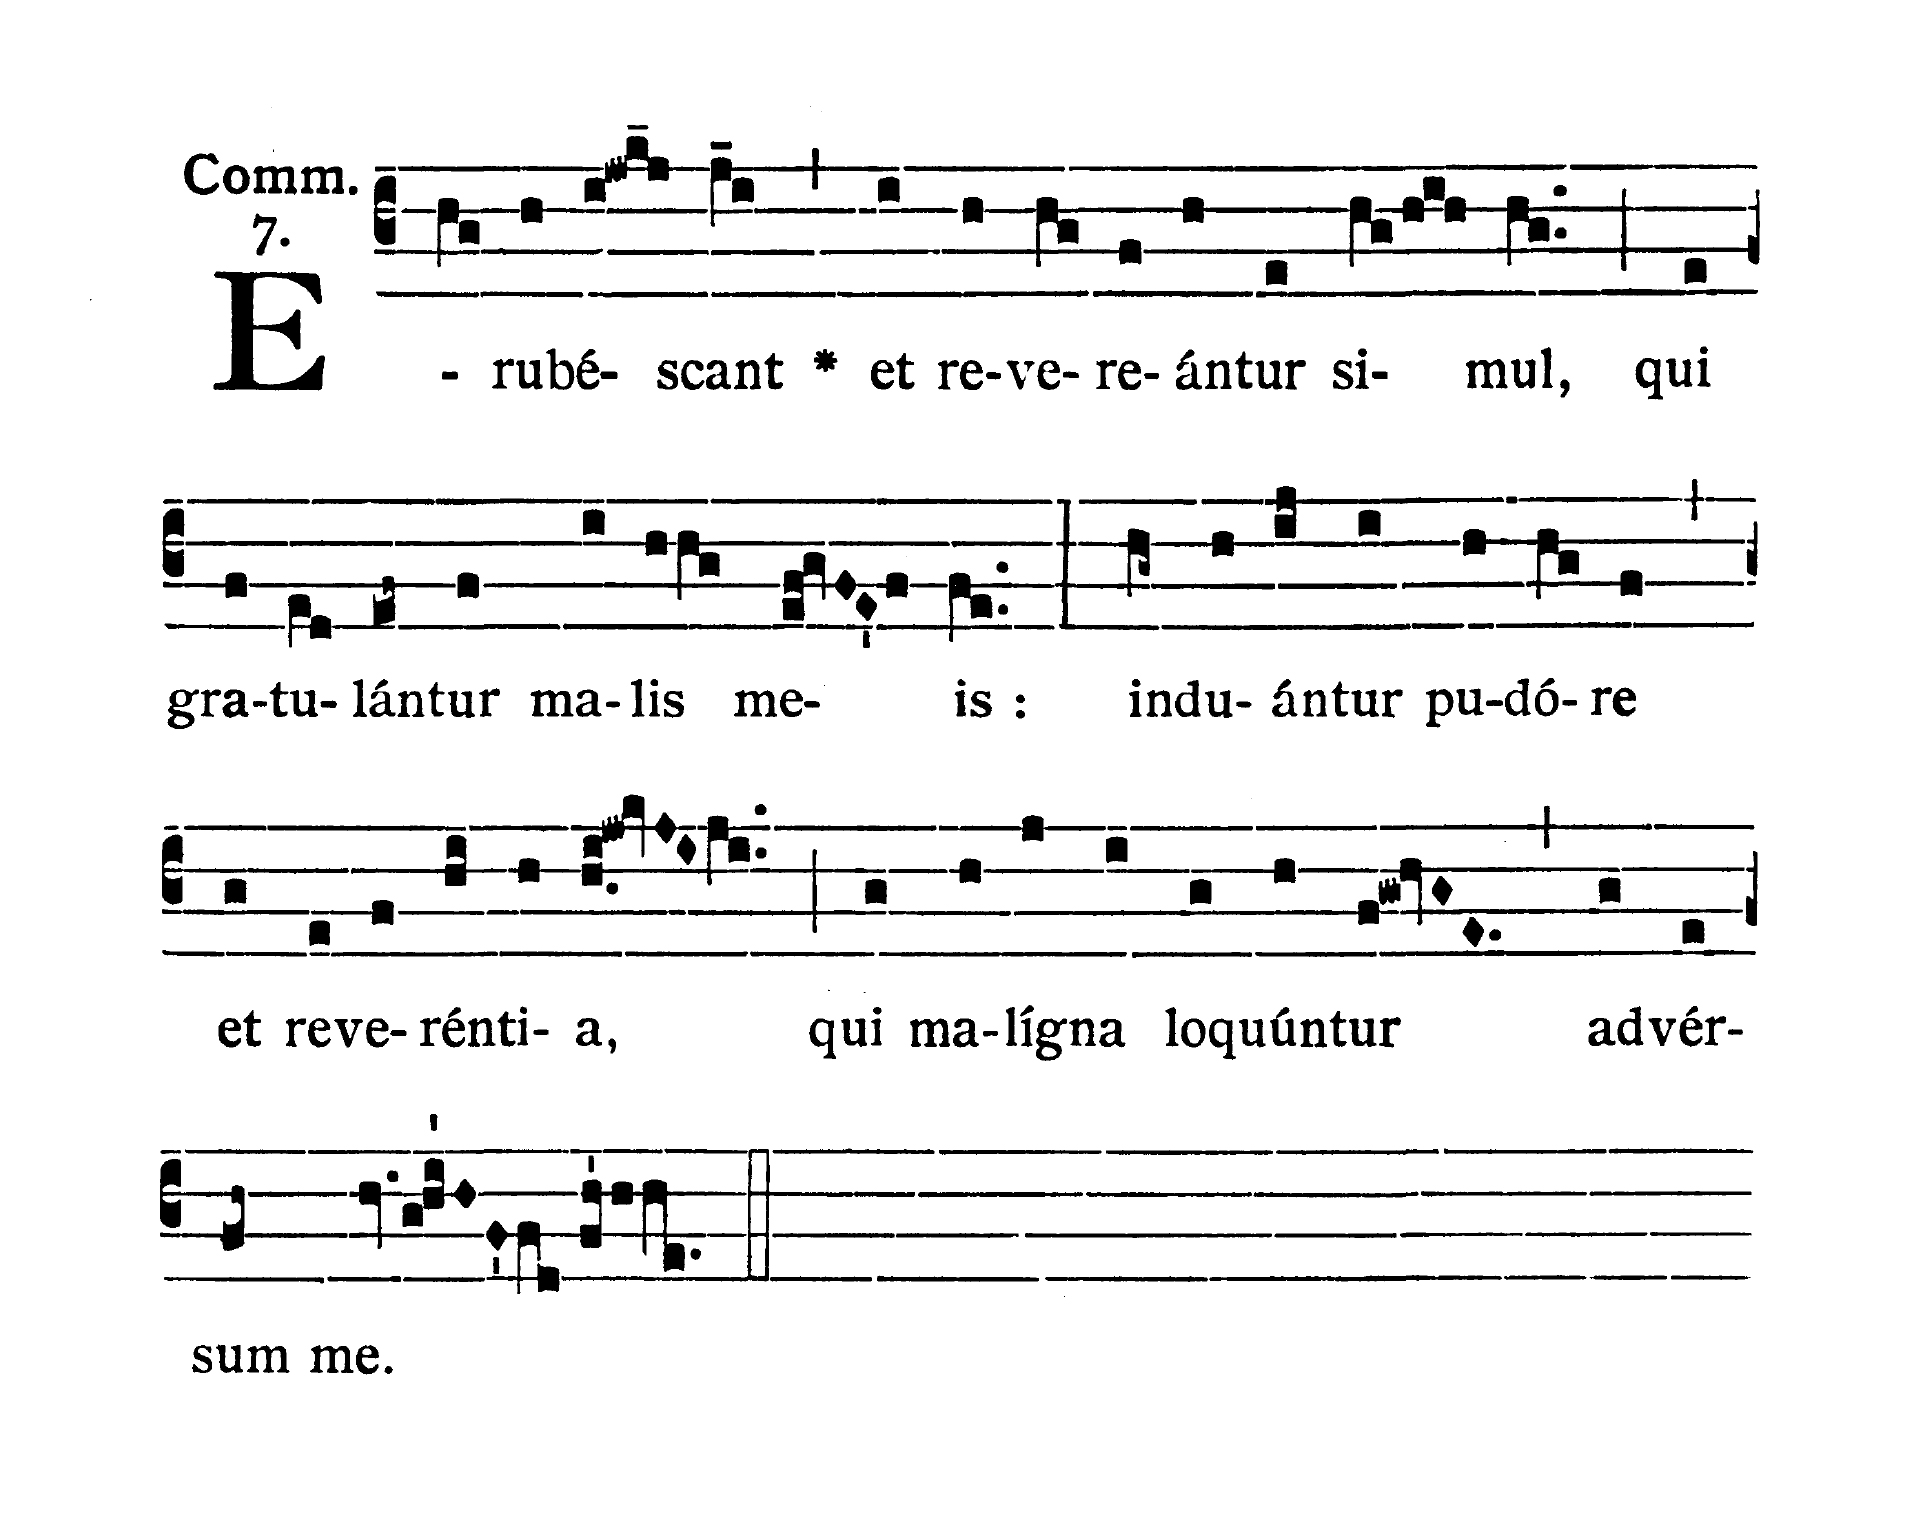 Feria II Hebdomadae Sanctae (Wielki Poniedziałek) - Communio (Erubescant et revereantur)